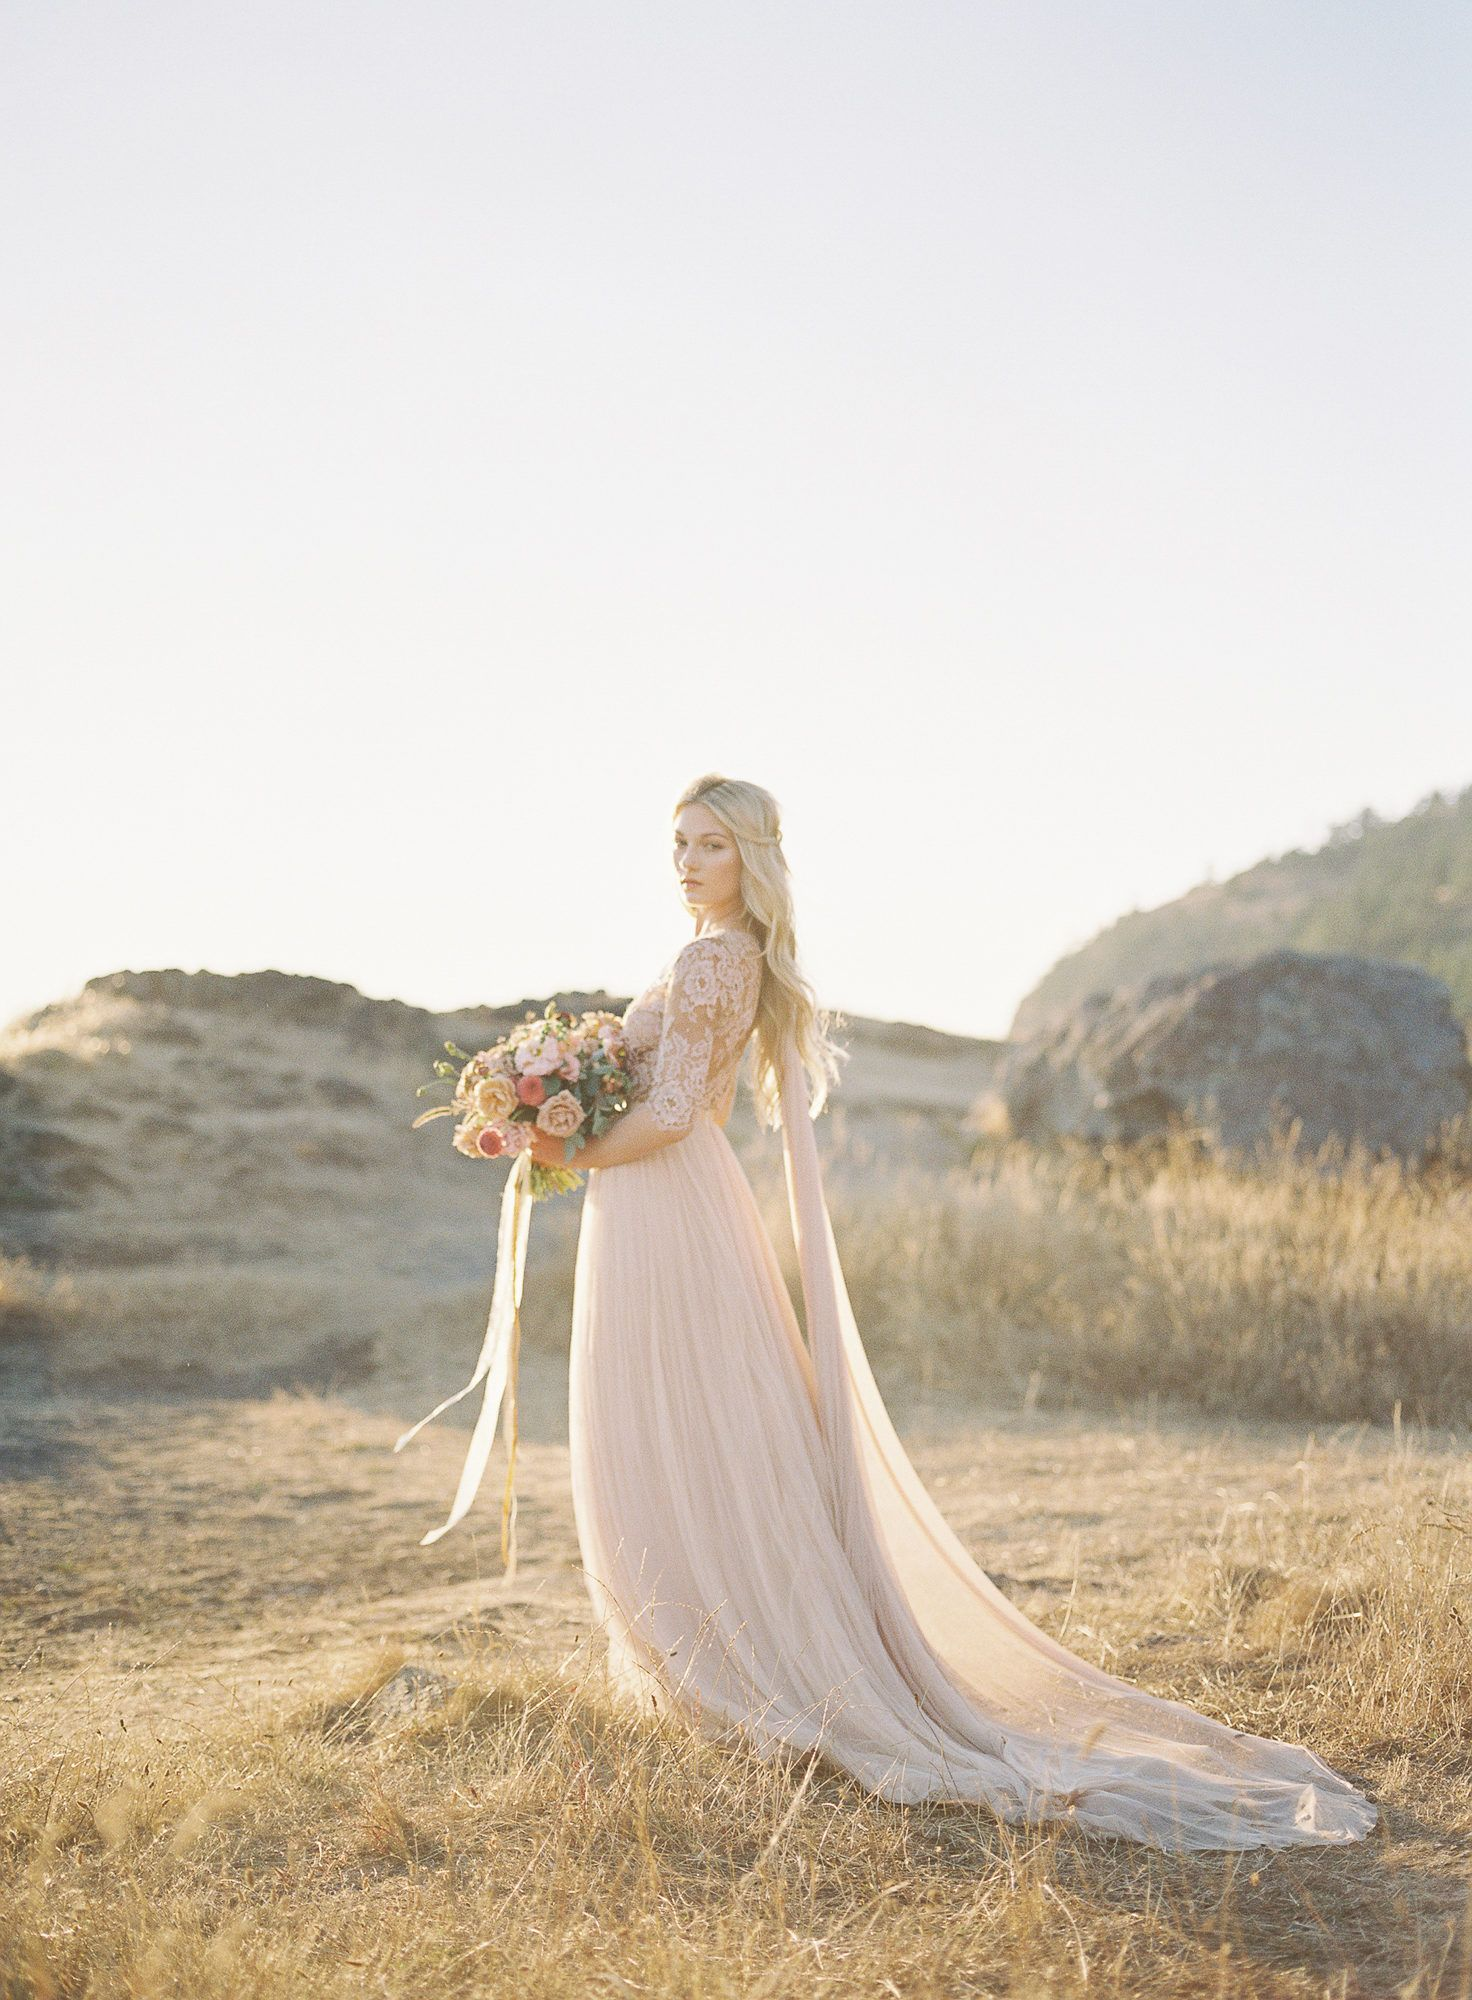 Wedding dress runaway bride  Gallery  Floret Flowers  Fine Art Weddings  Pinterest  Flowers